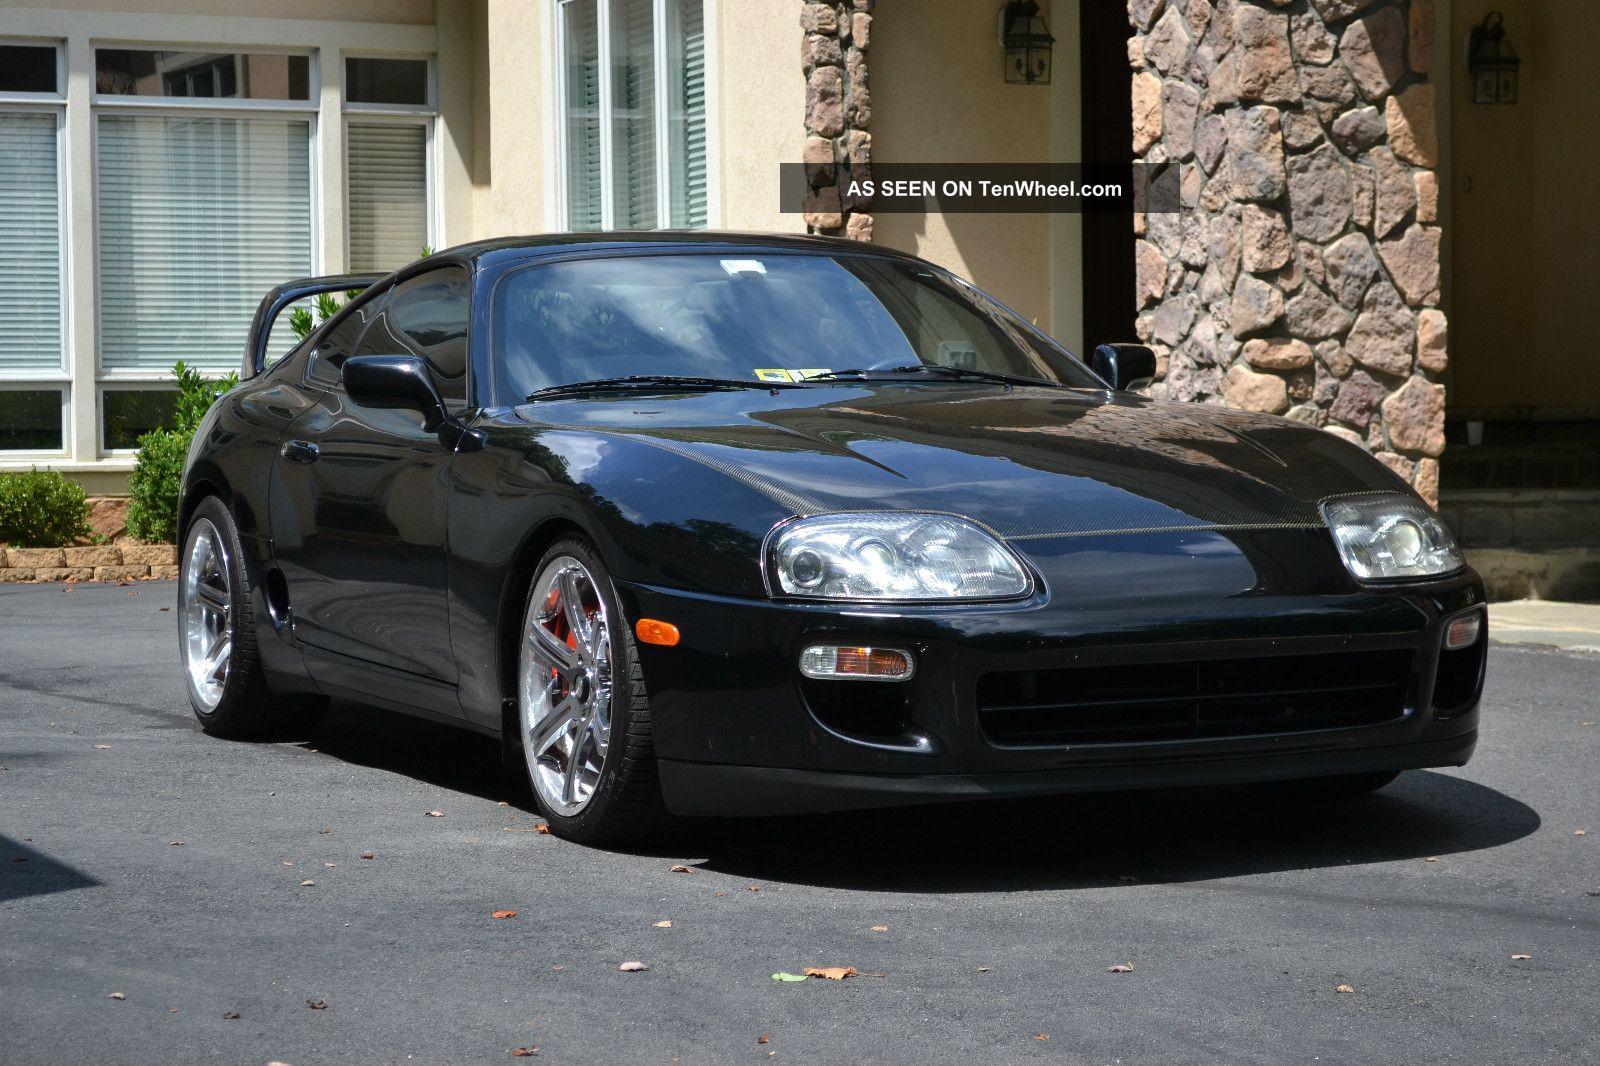 1998 Eclipse Gst Mitsubishi Dr Eclipse Gst Turbo 1998 Mitsubishi 2